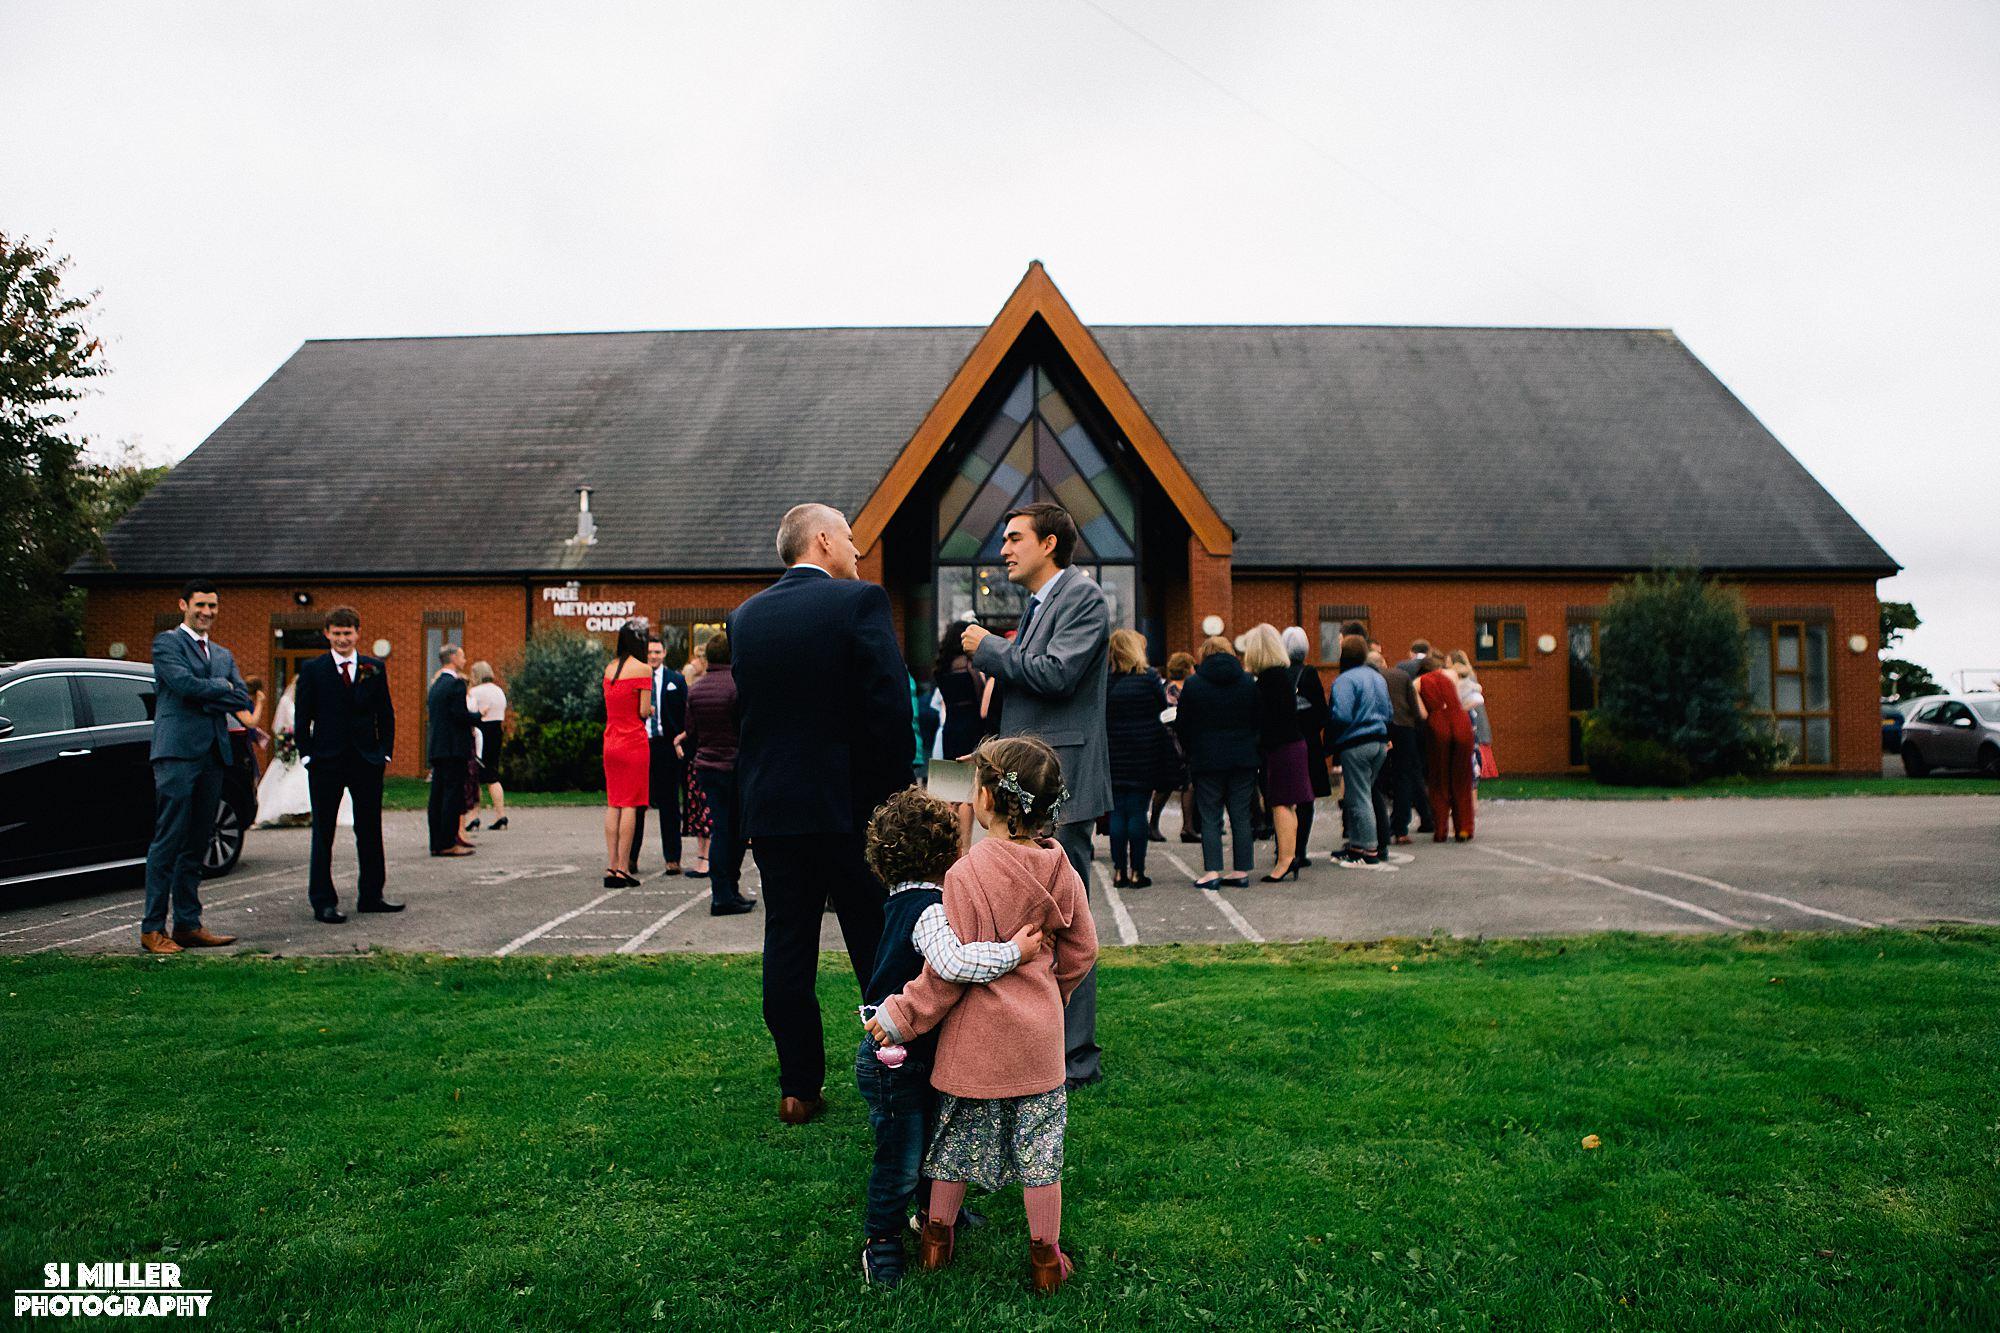 Children hugging in front of wedding guests at crown lane free methodist preston